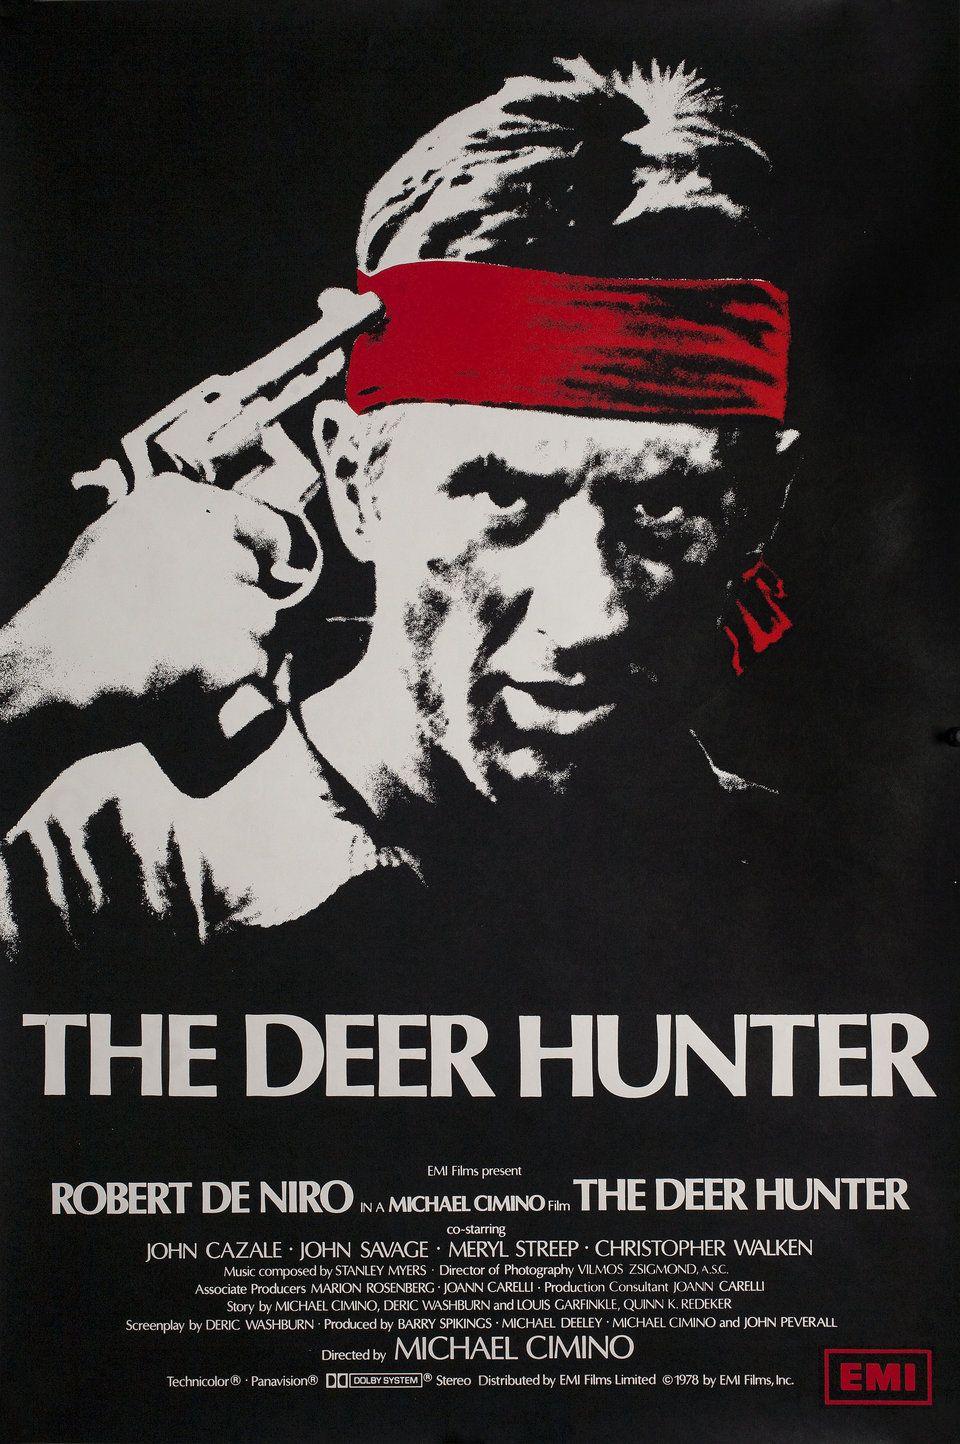 The Deer Hunter 1979 British Double Crown Poster Posteritati Movie Poster Gallery New York Hunter Movie Movie Posters Deer Hunters